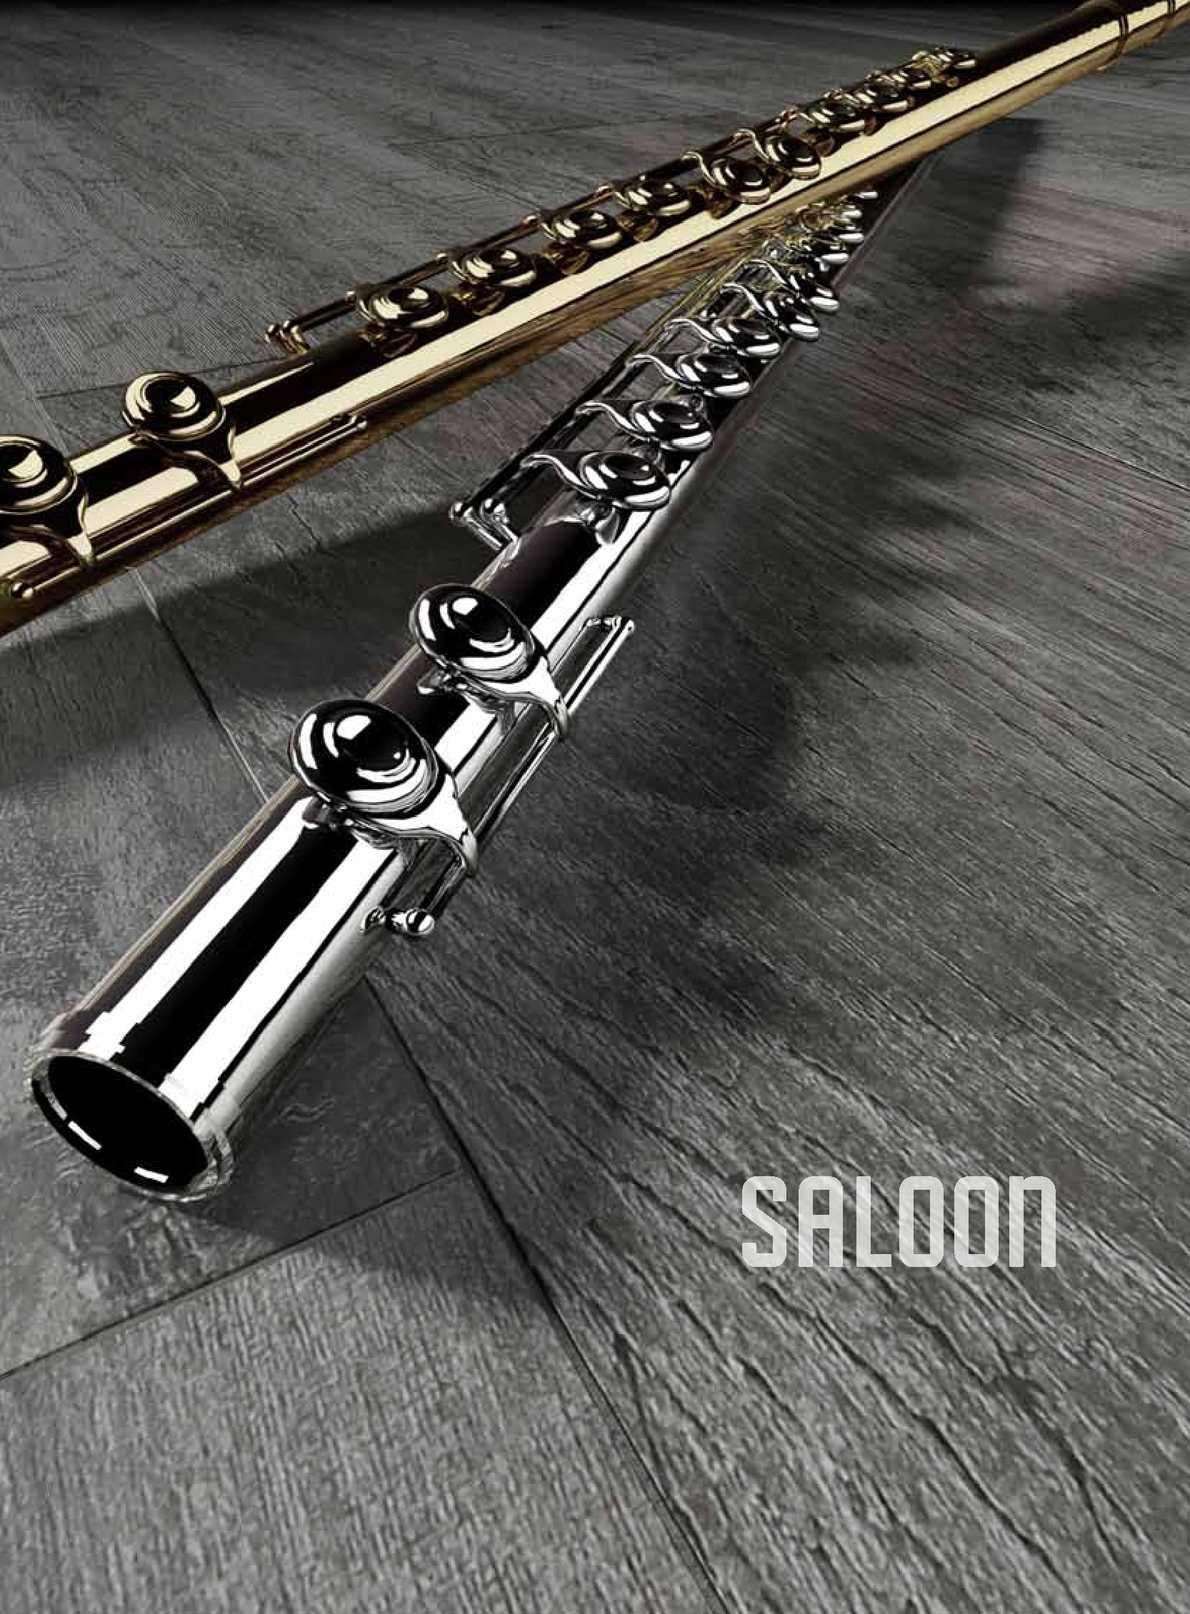 Calaméo - DELCONCA_FOLDER SALOON